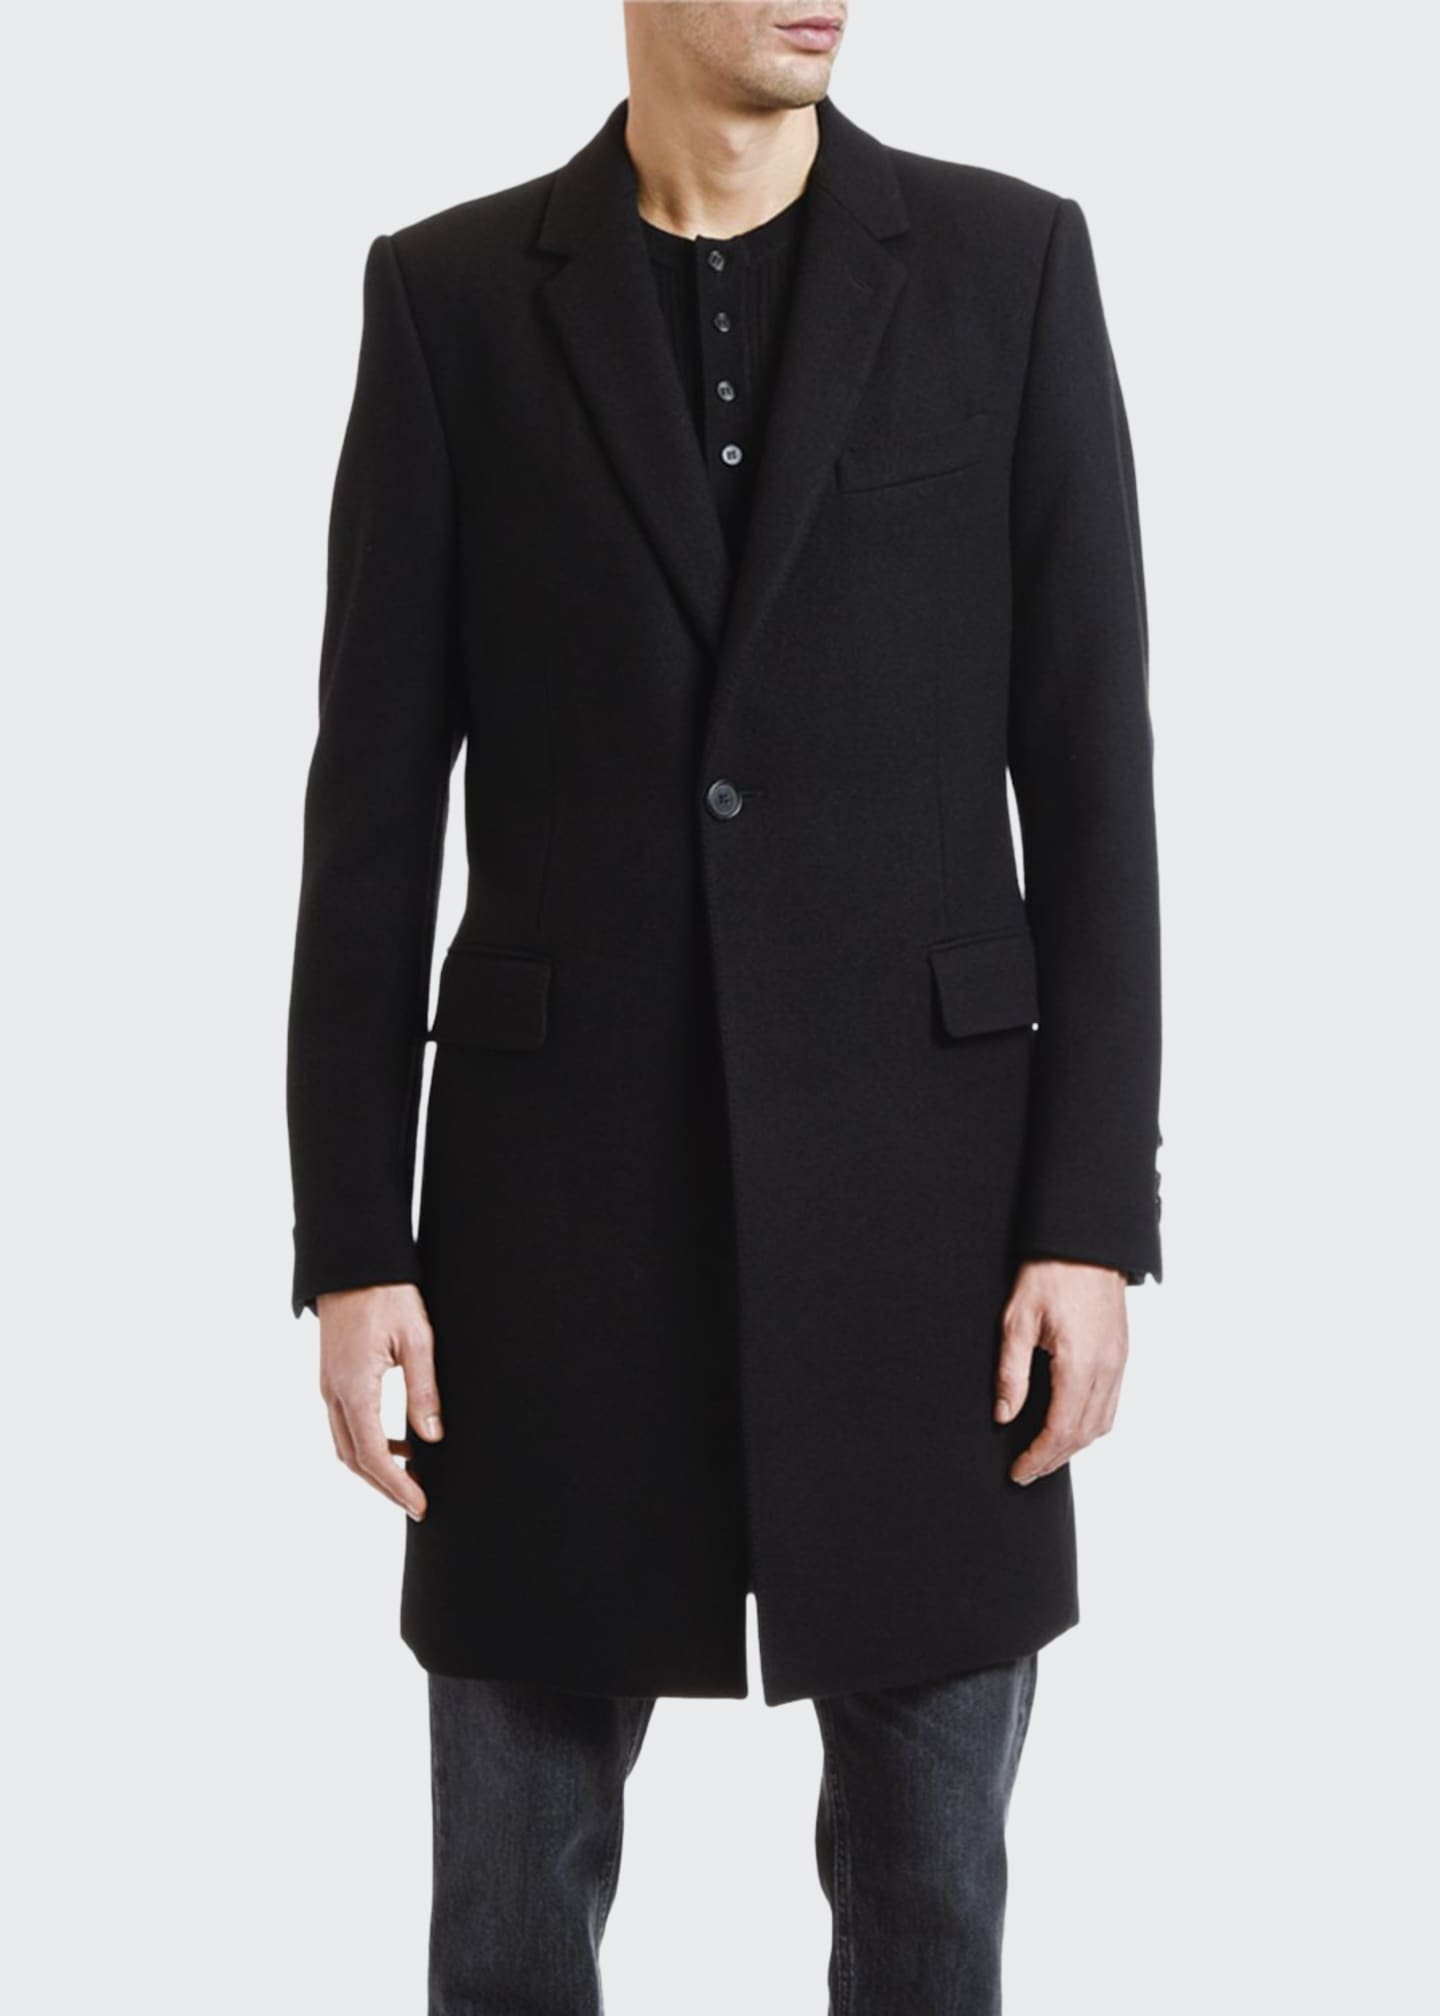 Dolce & Gabbana Men's Solid Wool-Blend Topcoat